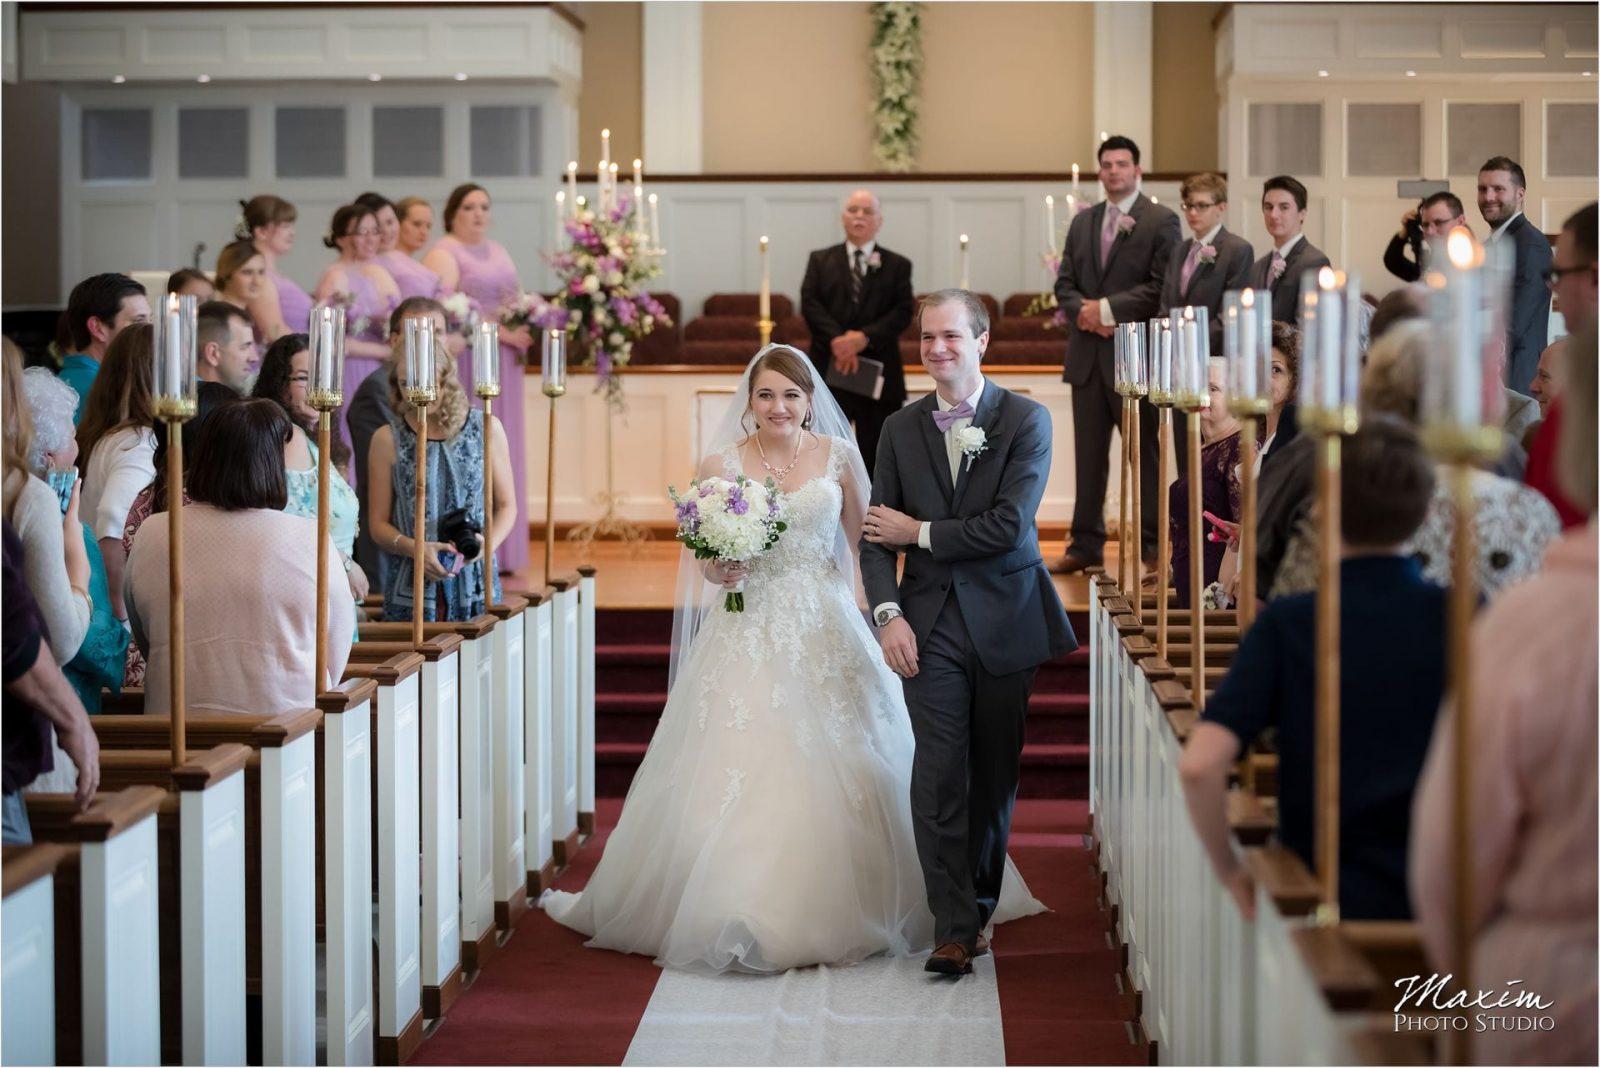 Anderson Hills UMC, Cincinnati Wedding Photography, Wedding Ceremony